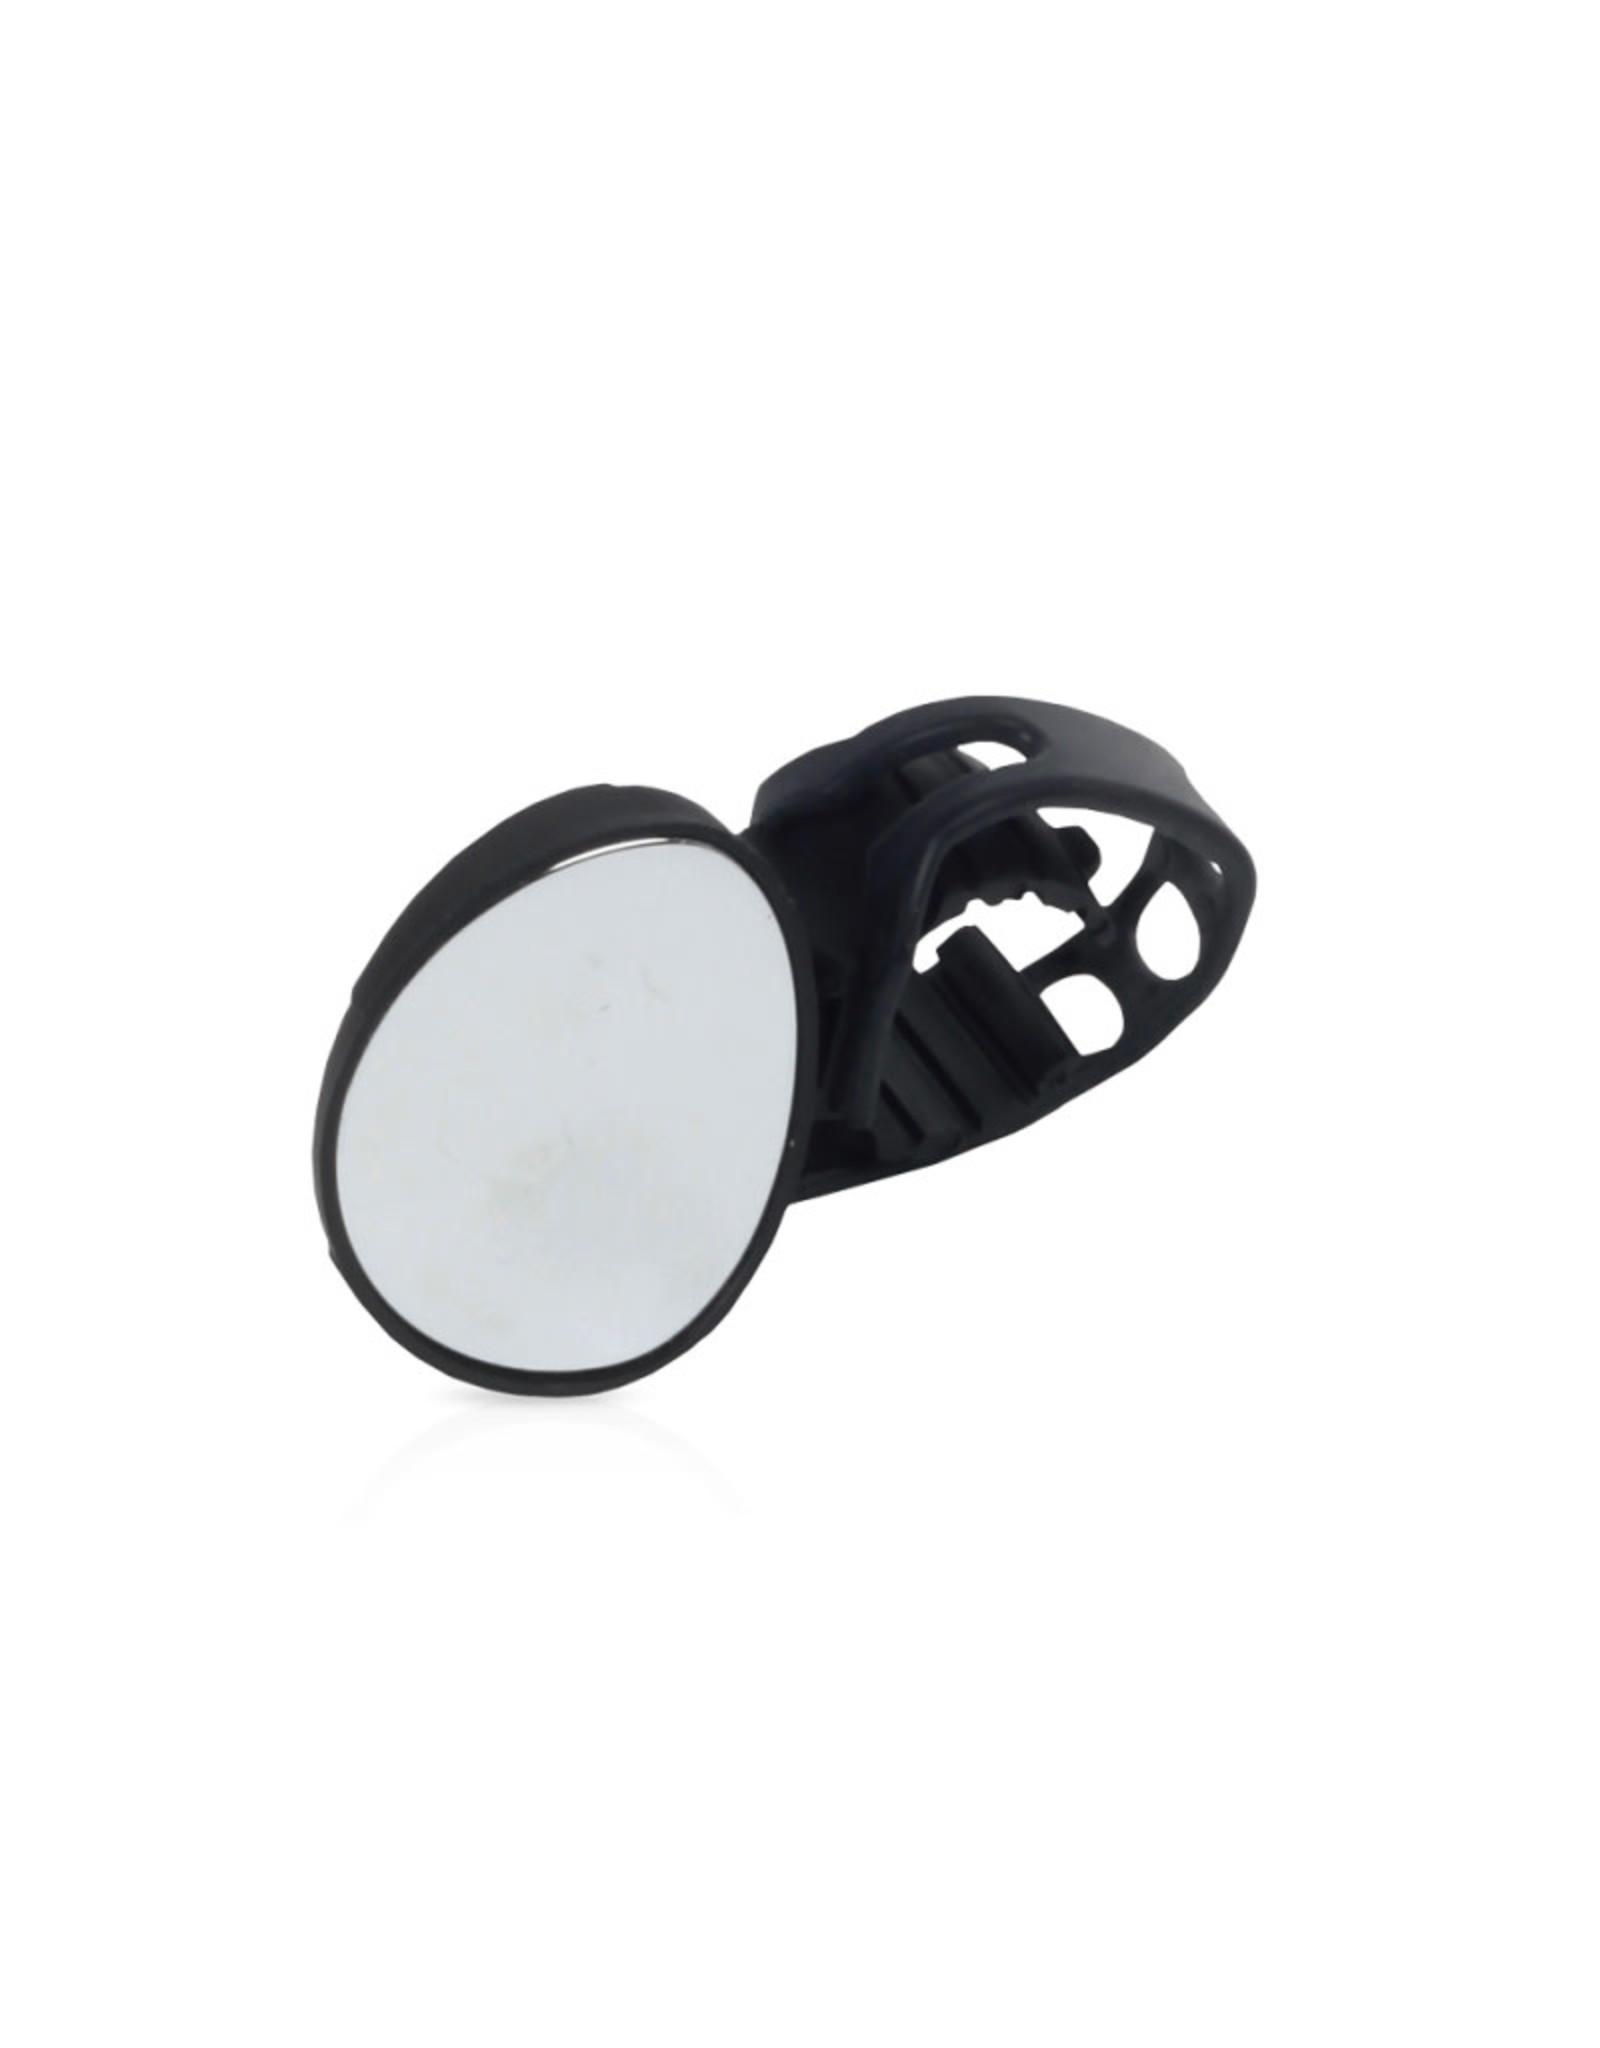 Zefal Mirror Zéfal Spy universal attach